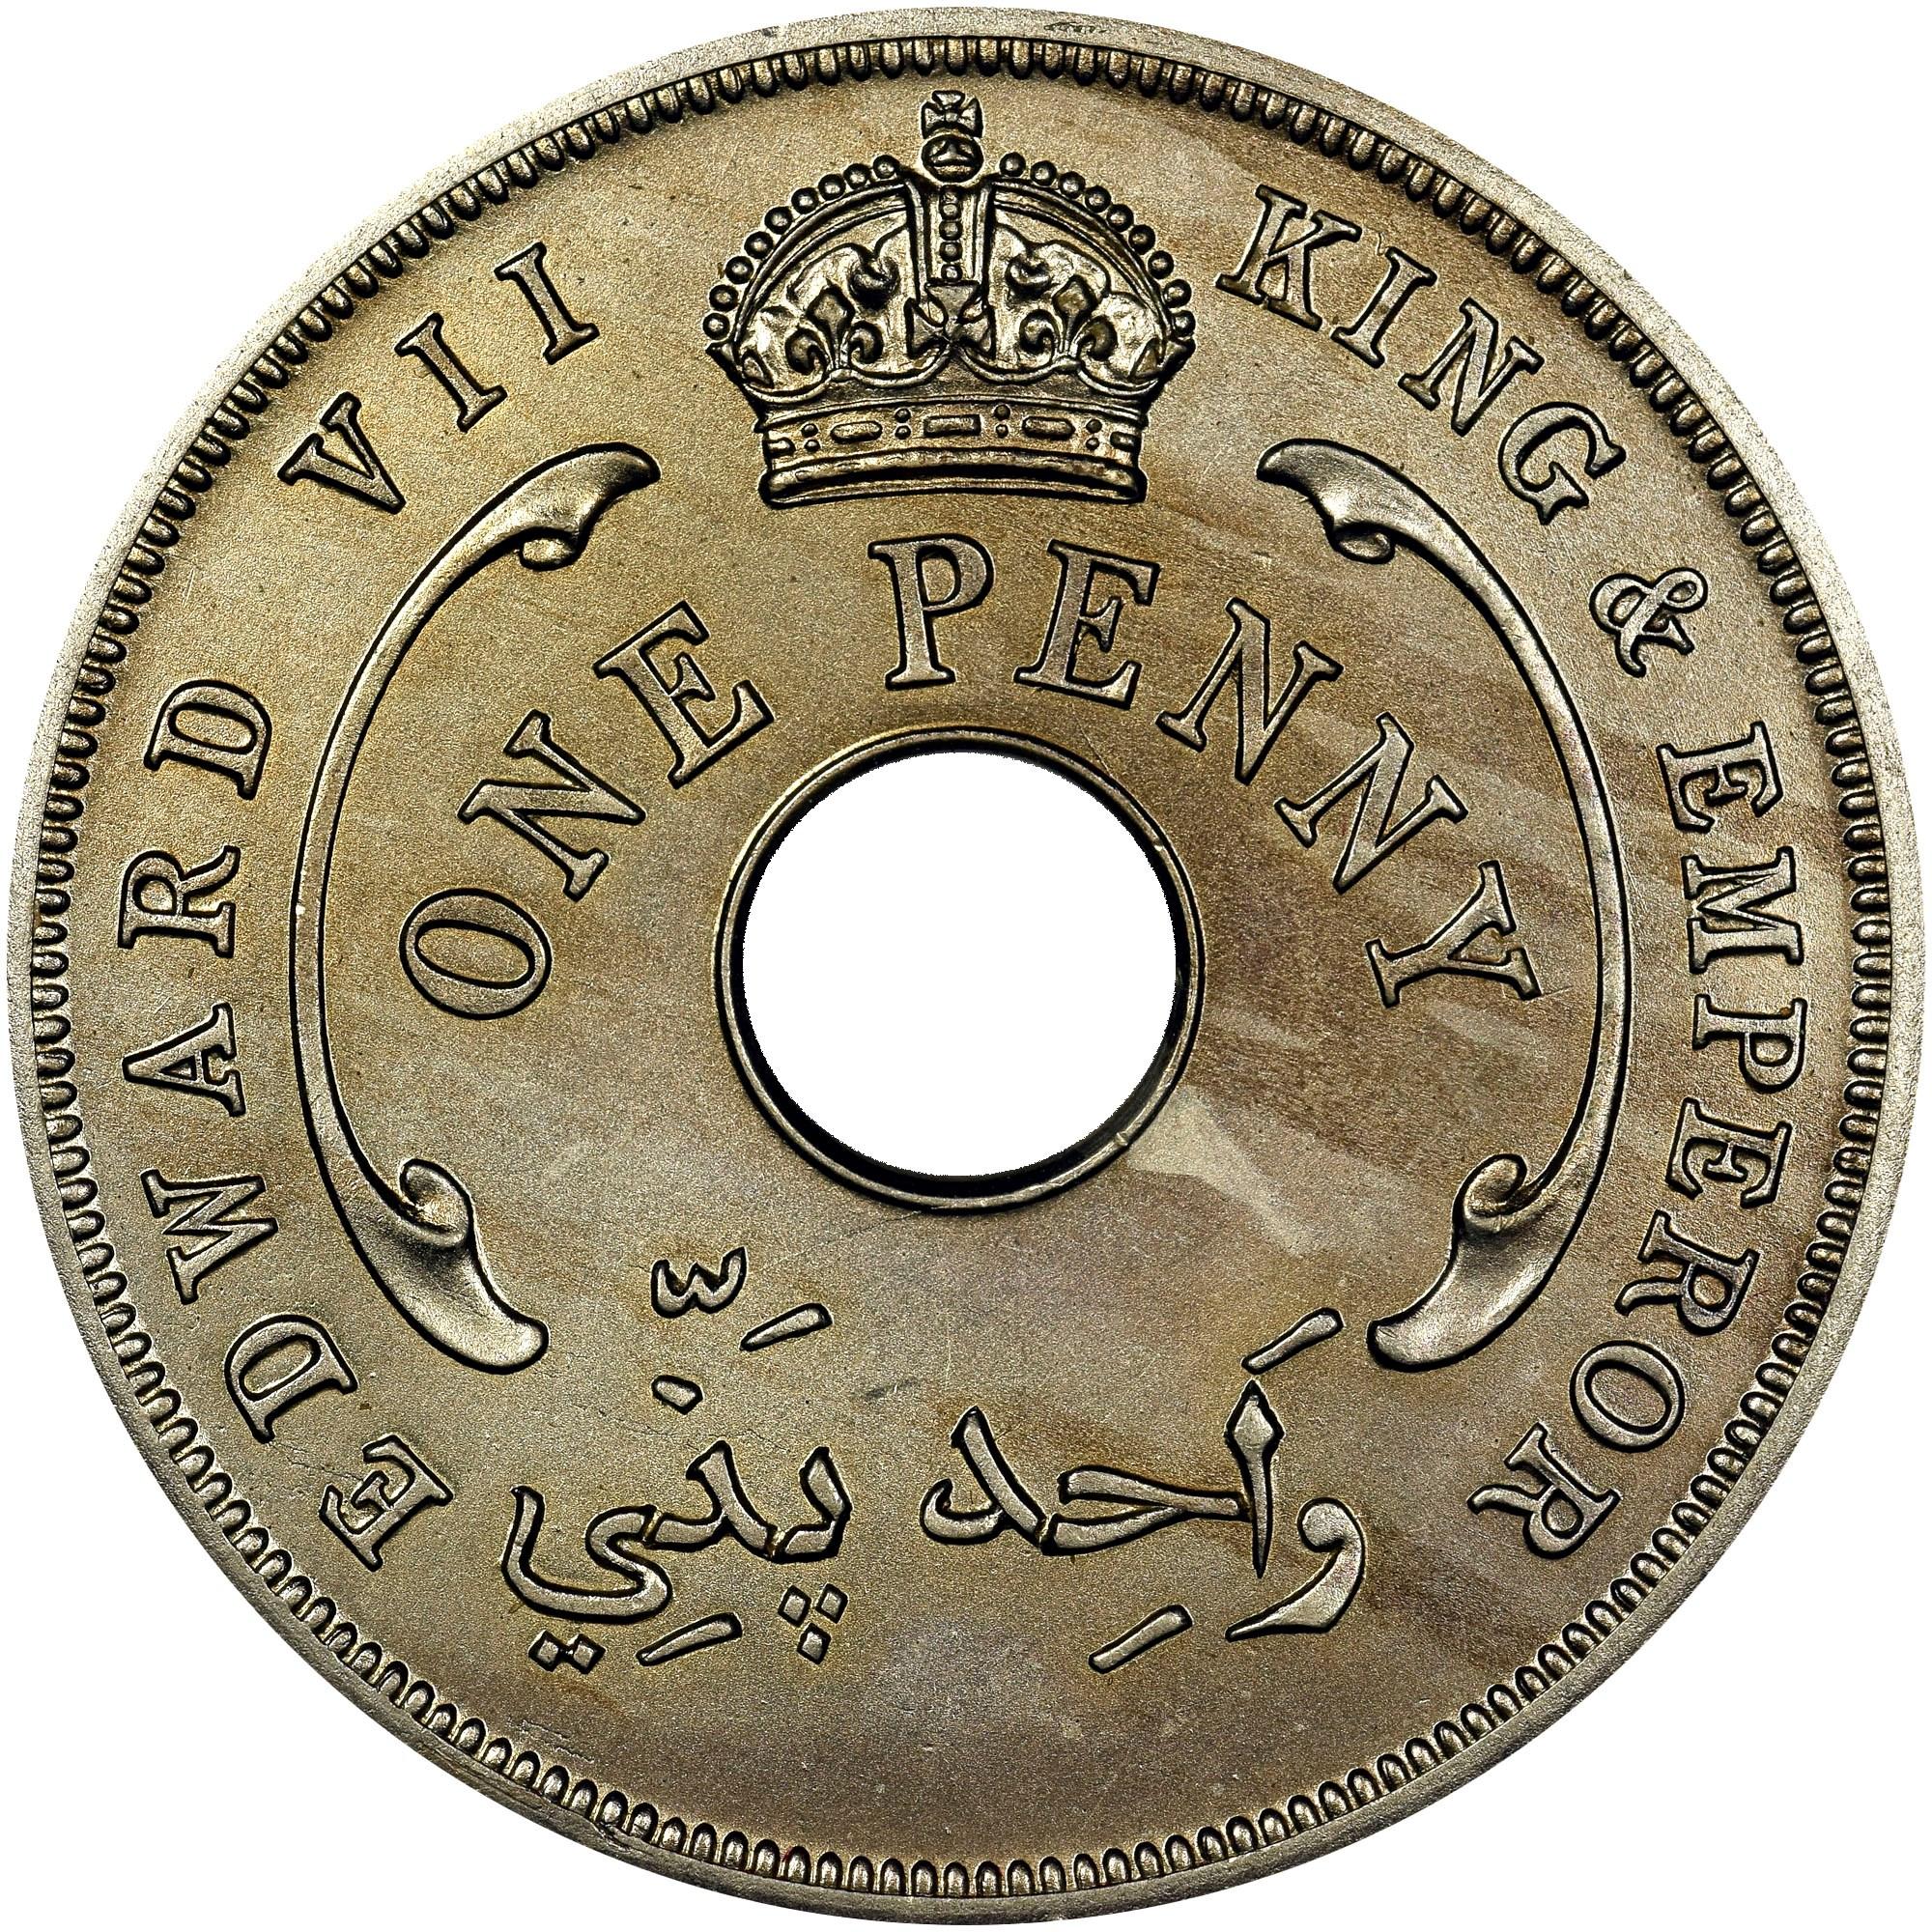 British West Africa Penny obverse